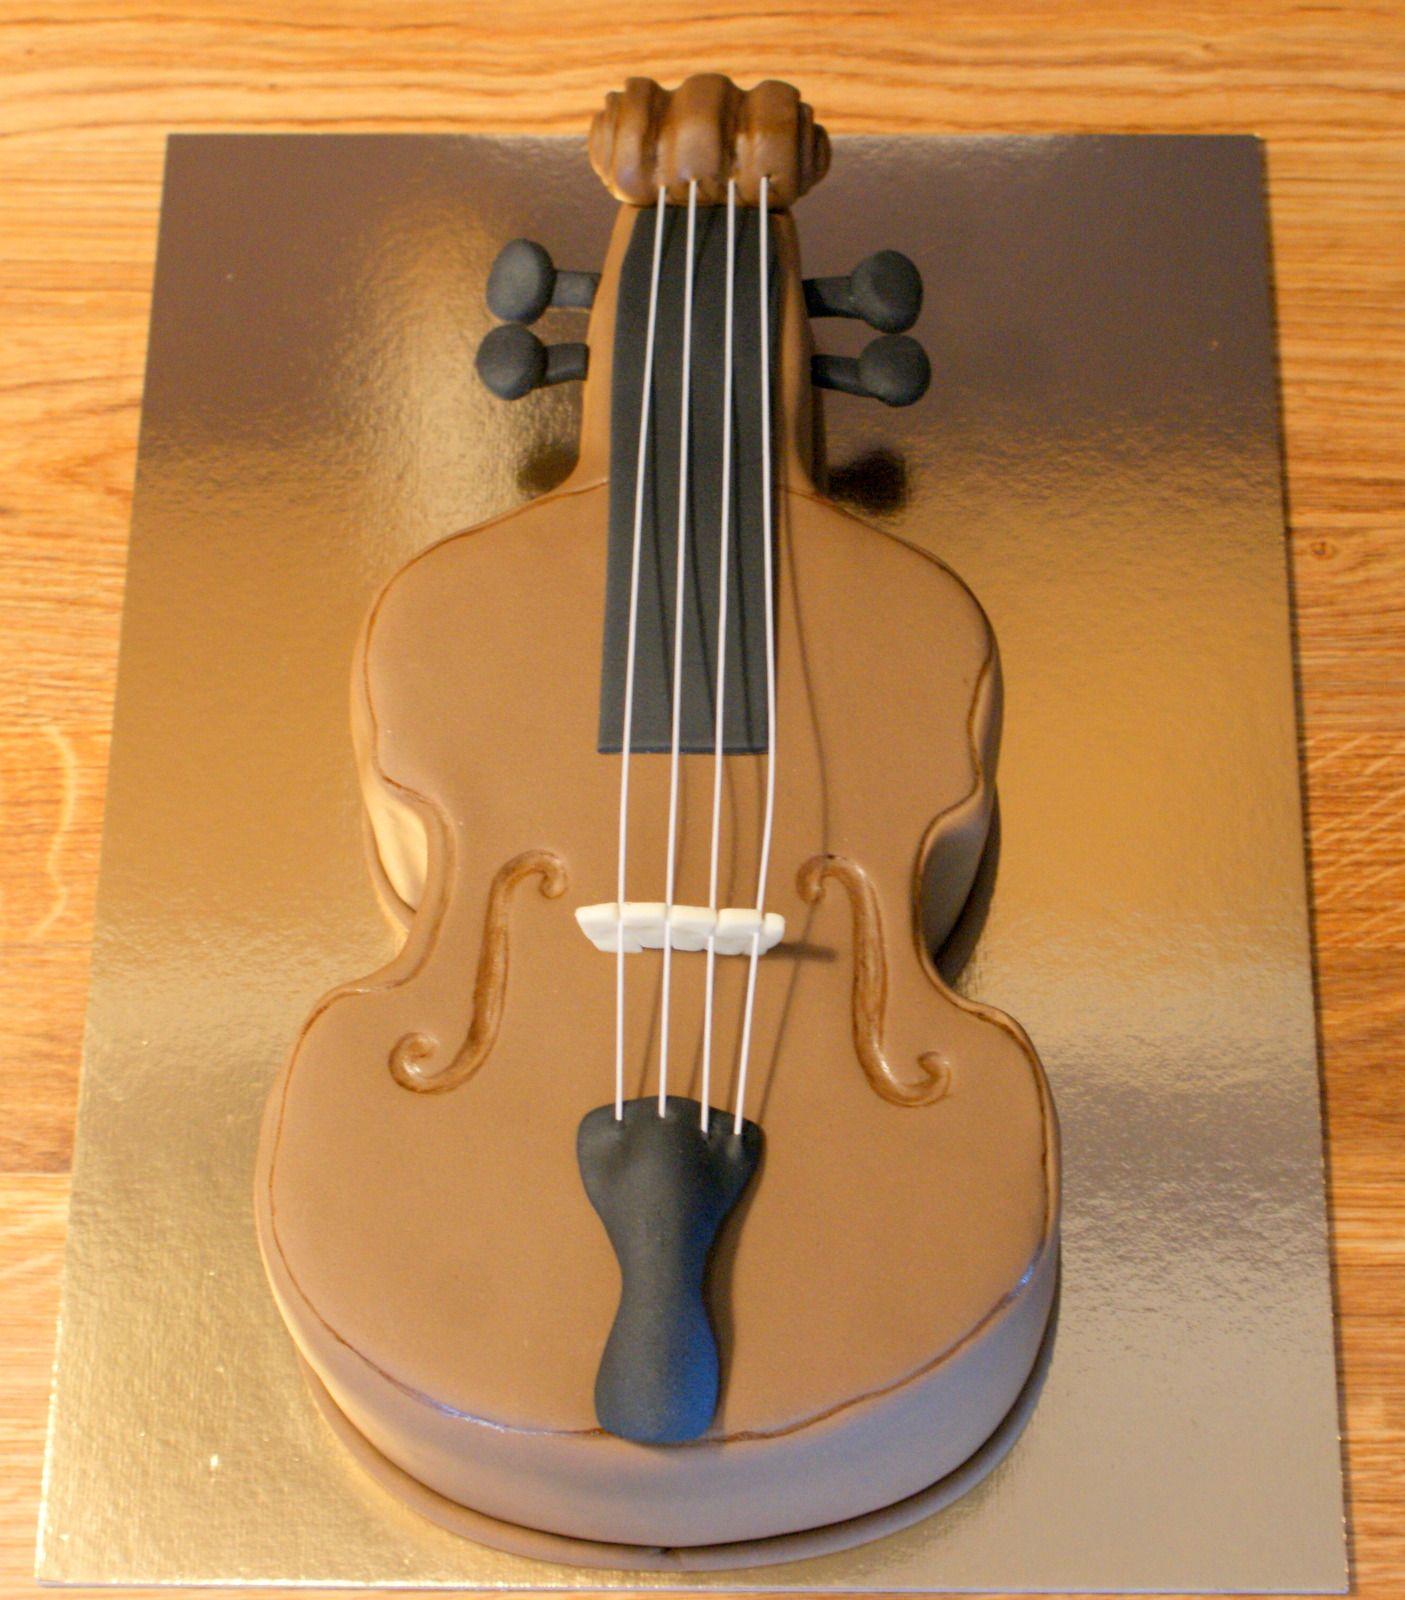 Violin Cake My Cakes Pinterest Violin Cake Cake And